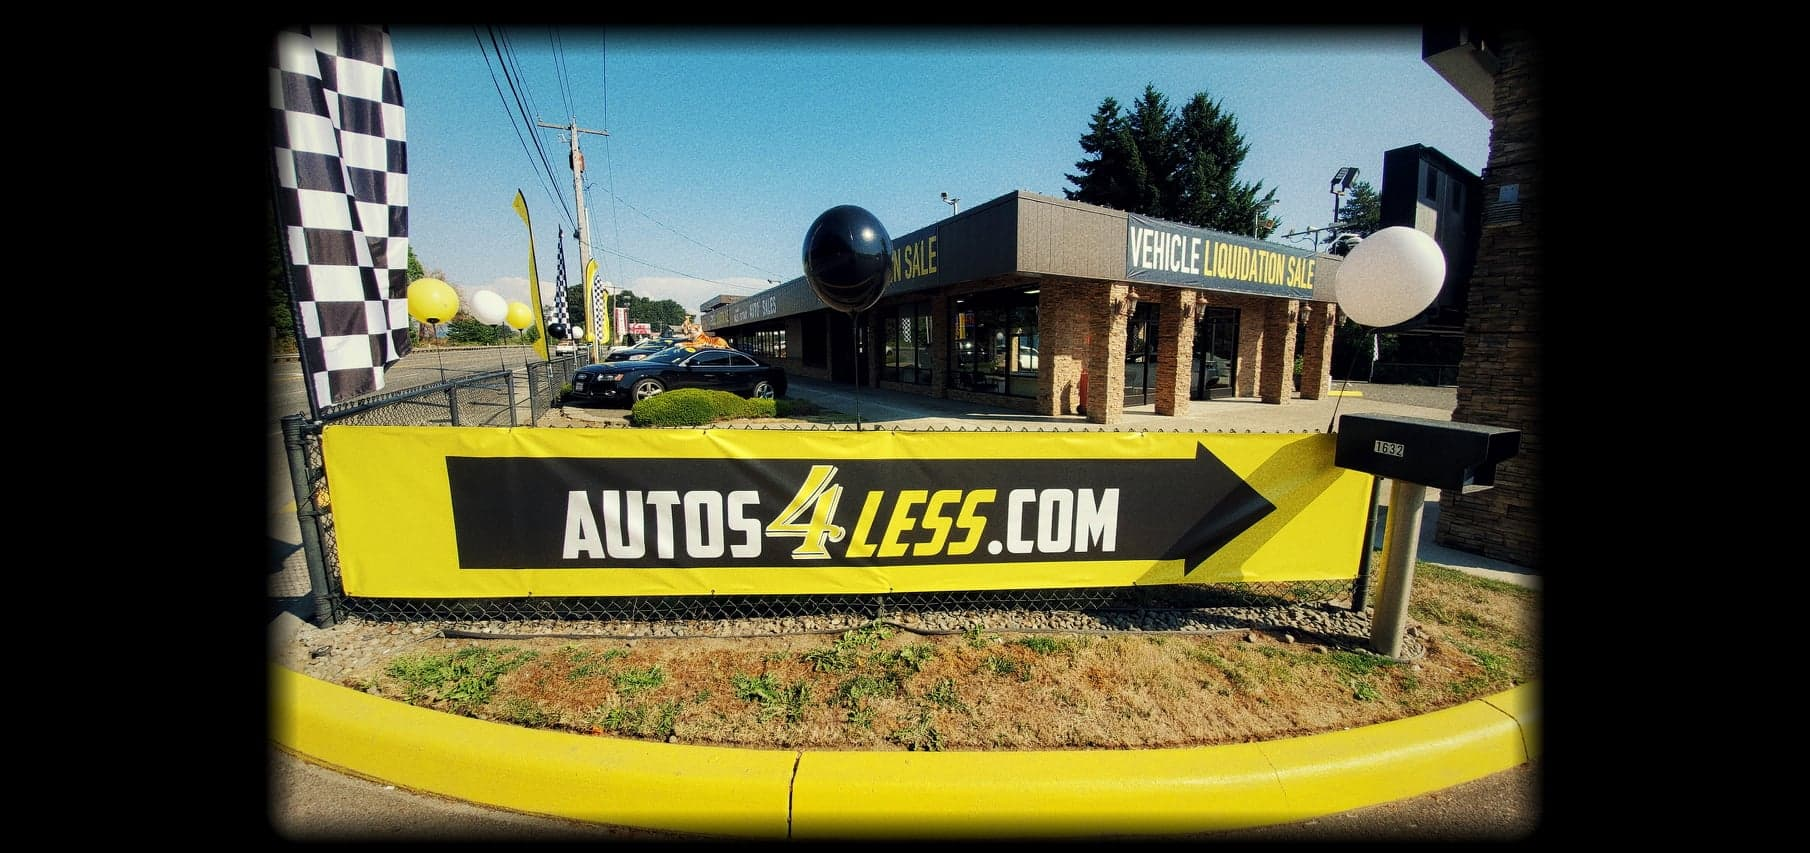 Autos4Less Used Car Dealership